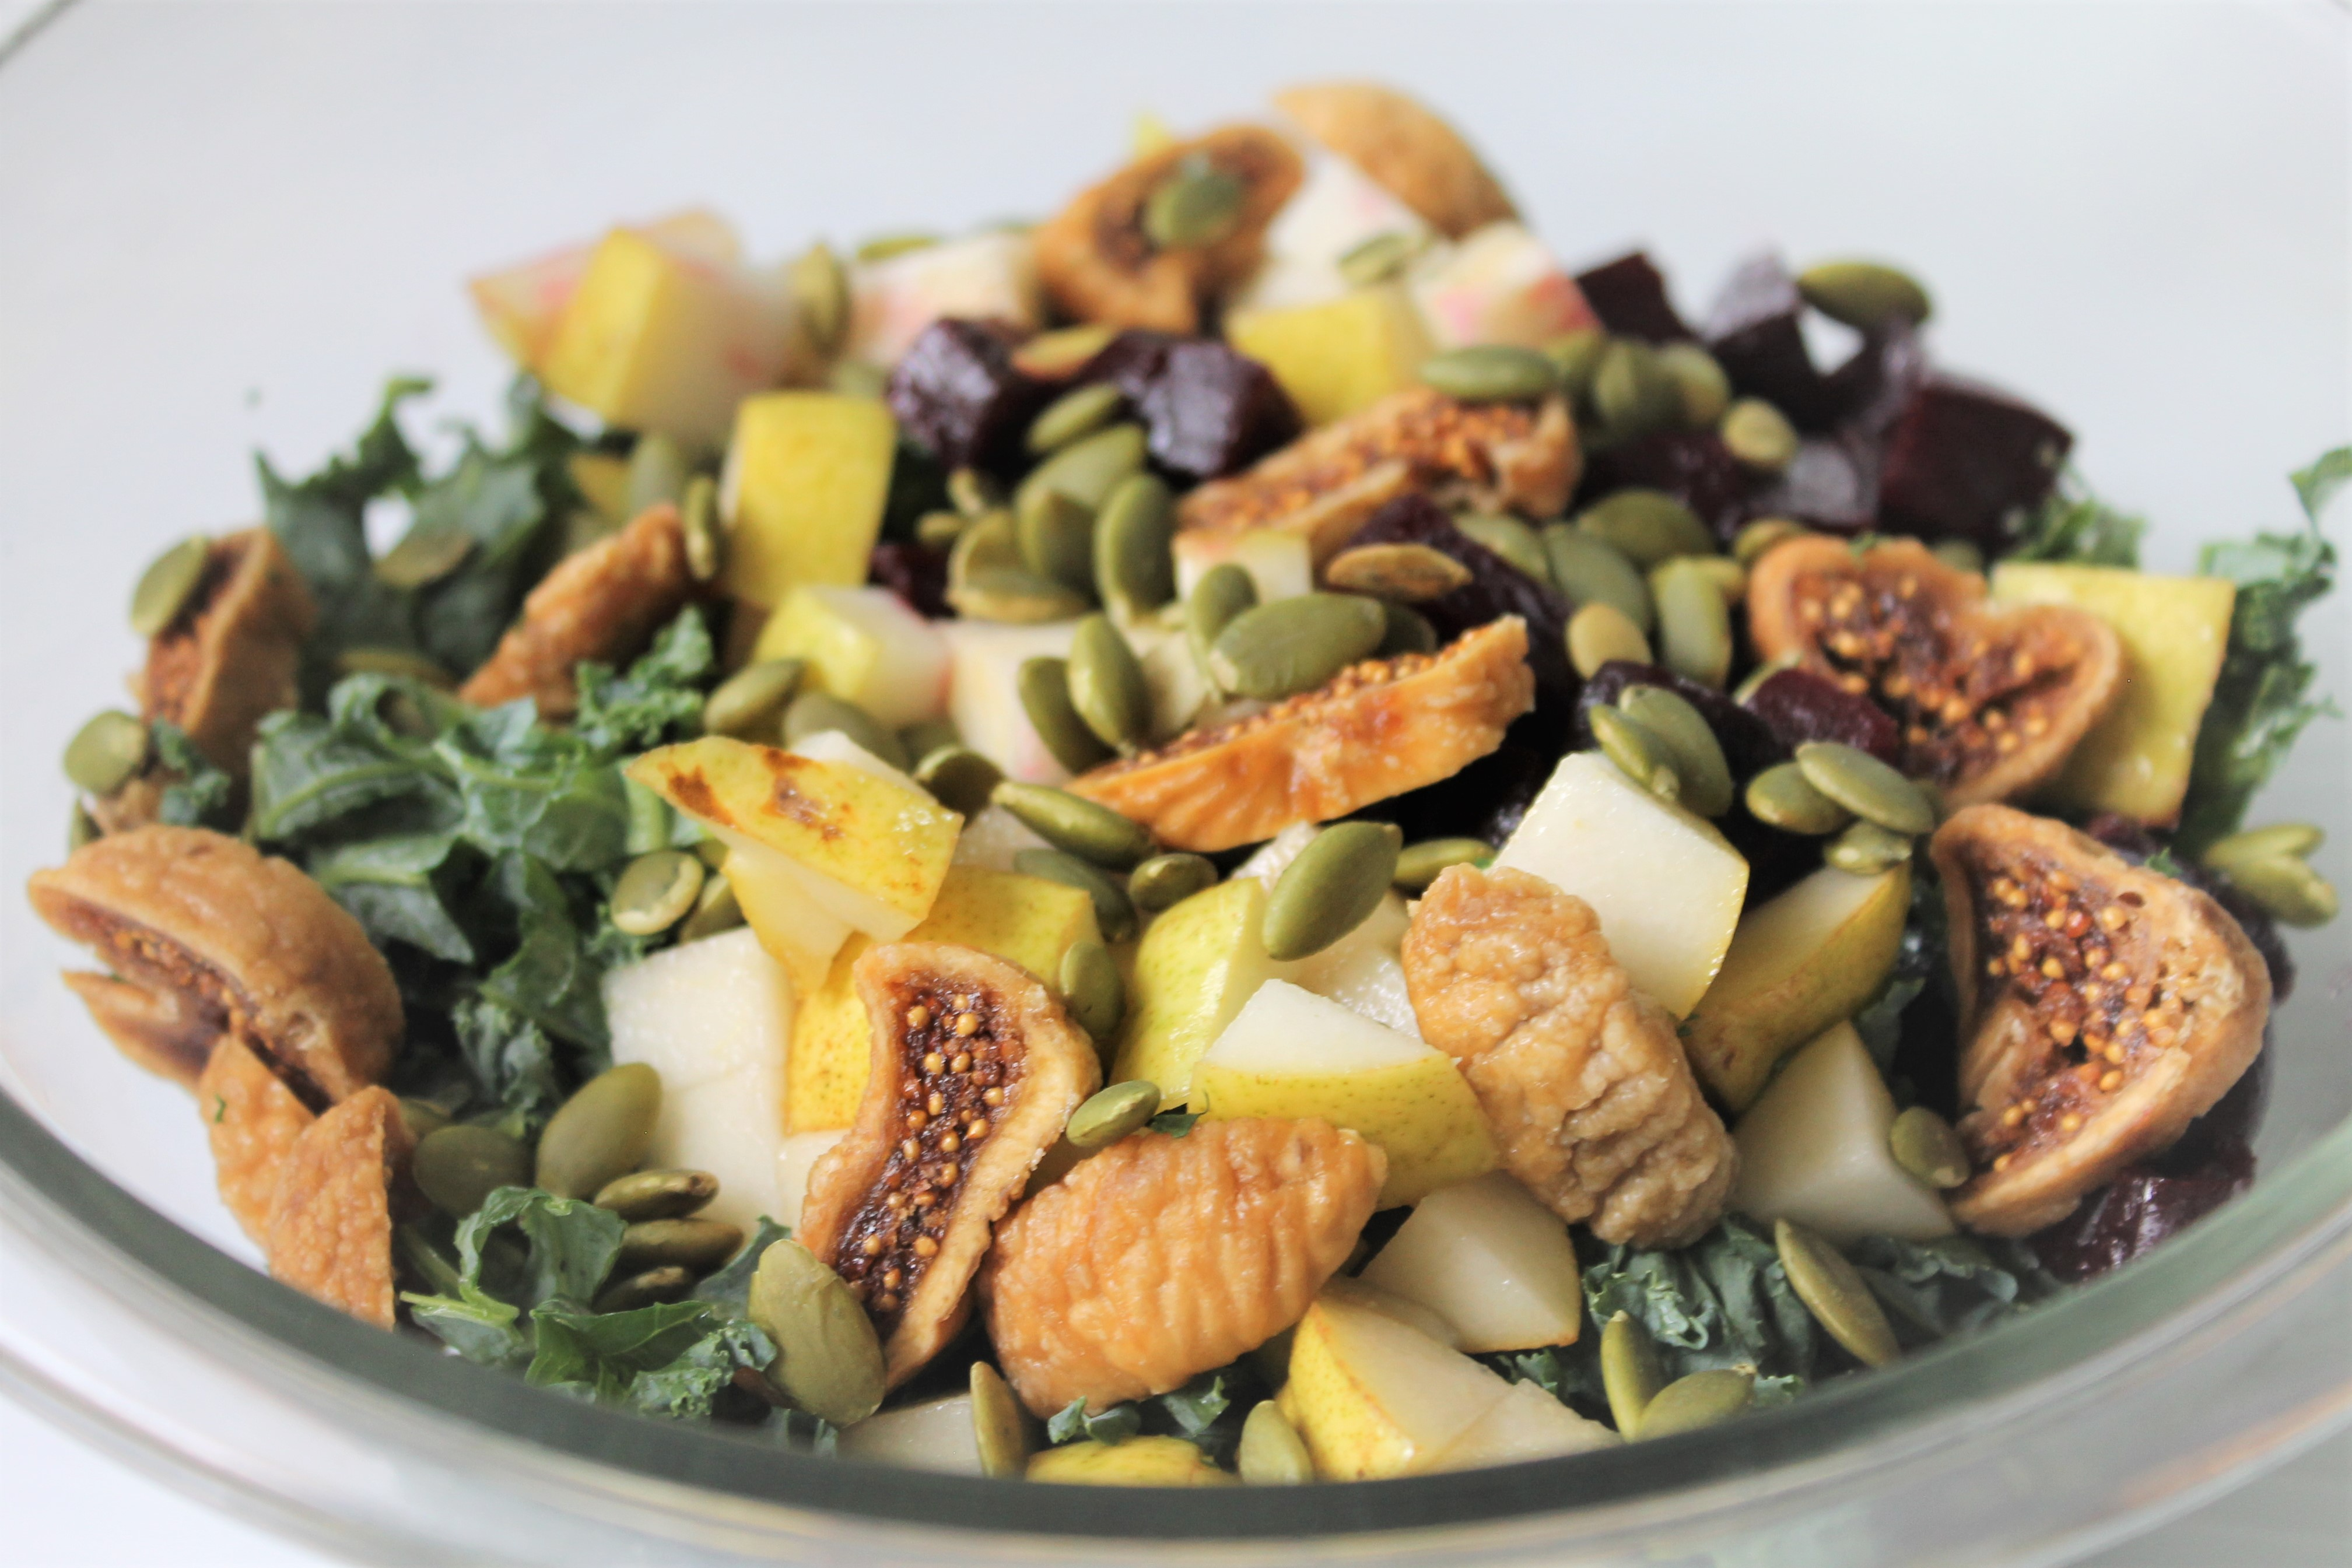 Kale, Pear, and Beet Salad